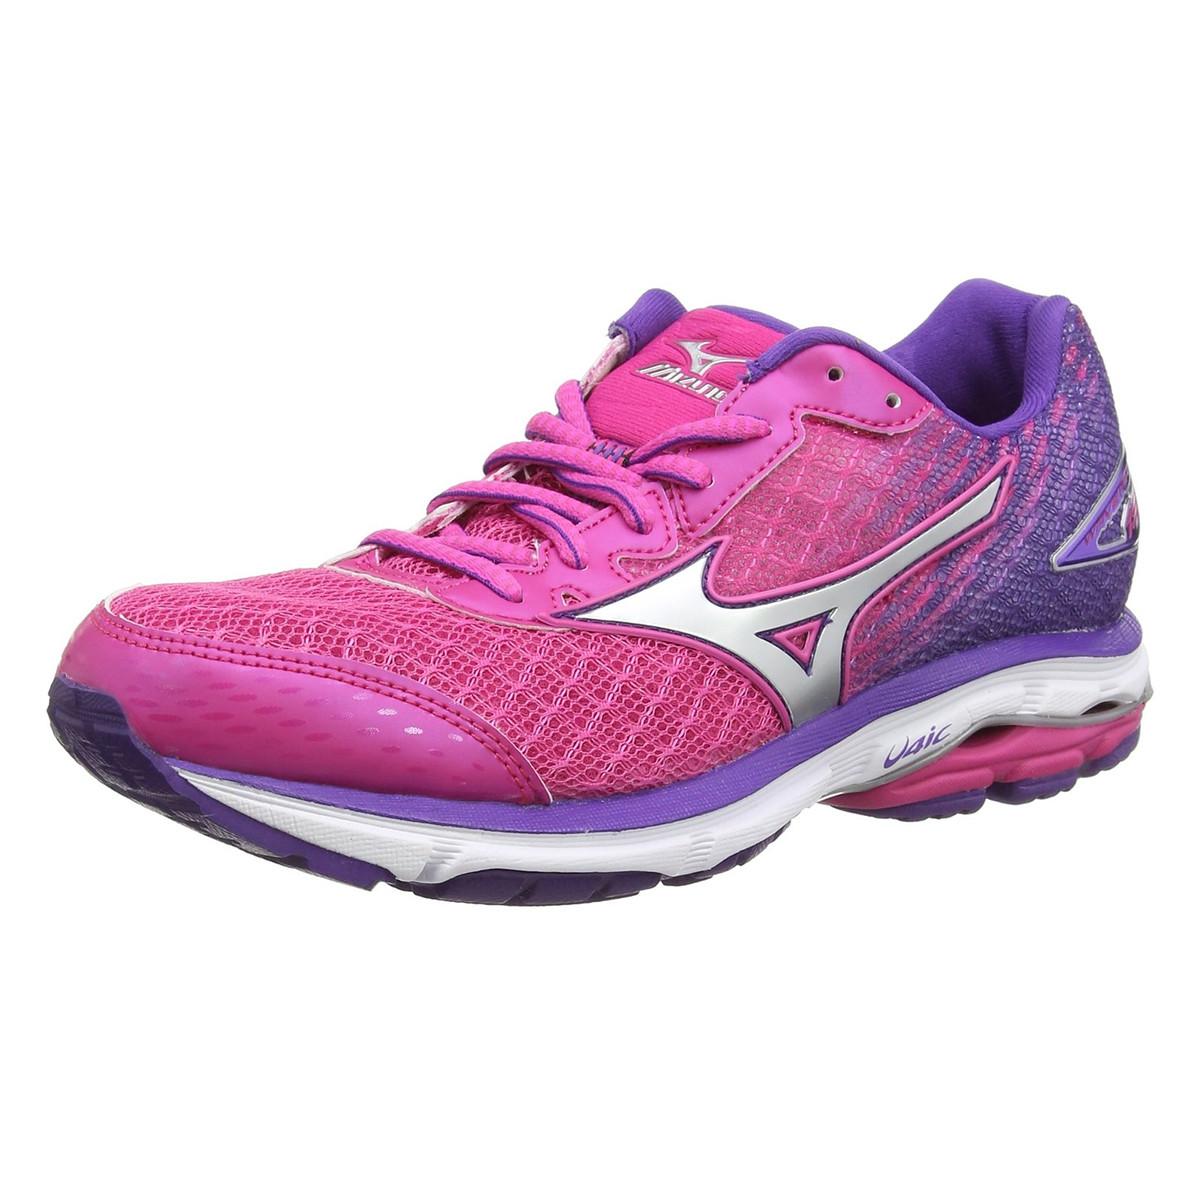 1fb7b42e3a3 Wave Rider 19 Chaussure Femme MIZUNO ROSE pas cher - Chaussures de ...